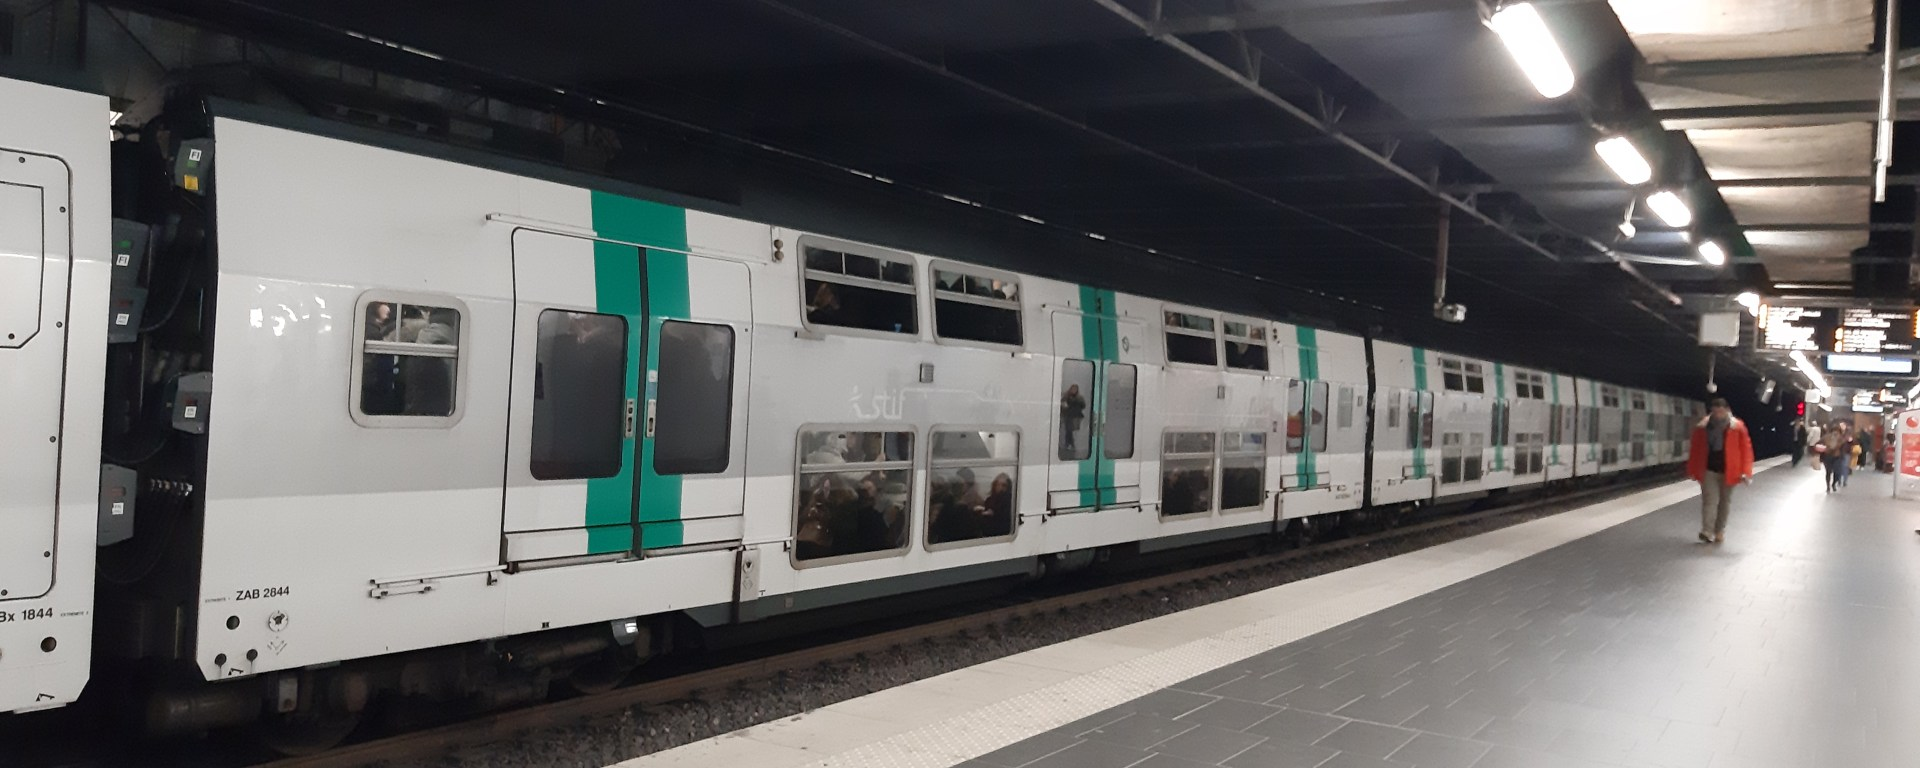 RER Train in Paris